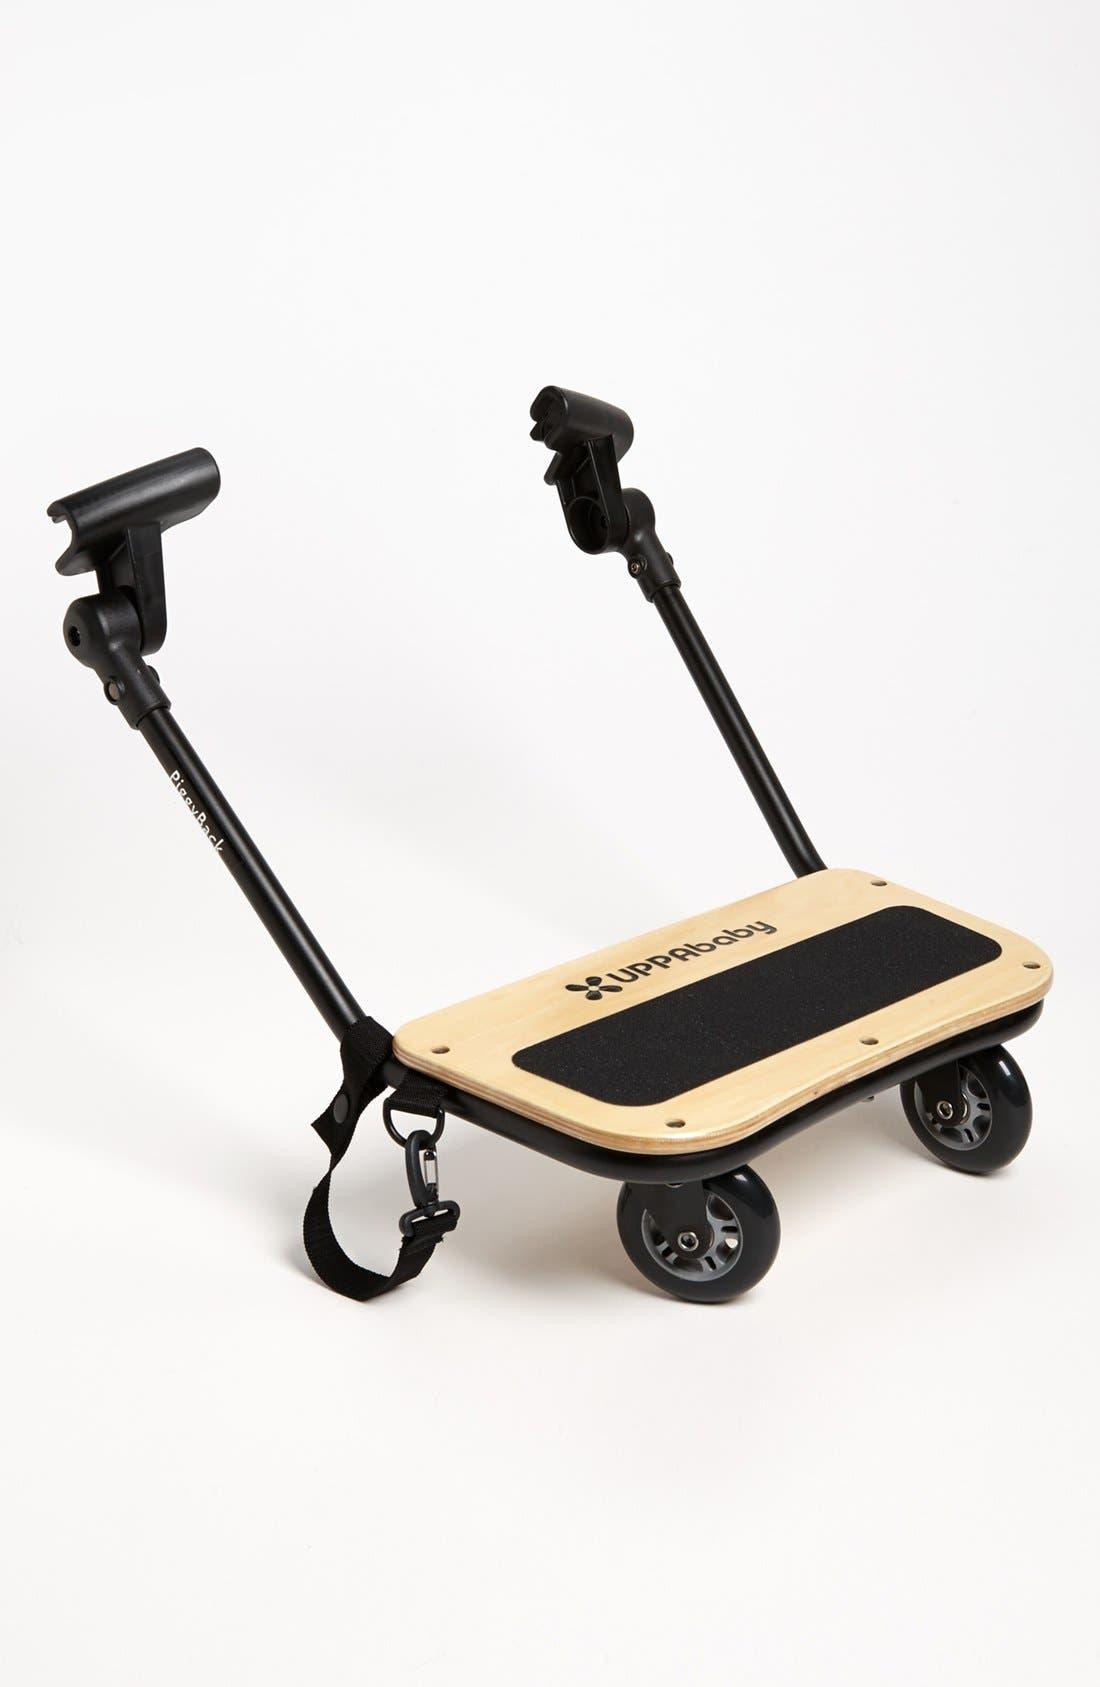 Main Image - UPPAbaby VISTA Stroller PiggyBack™ Ride-Along Board